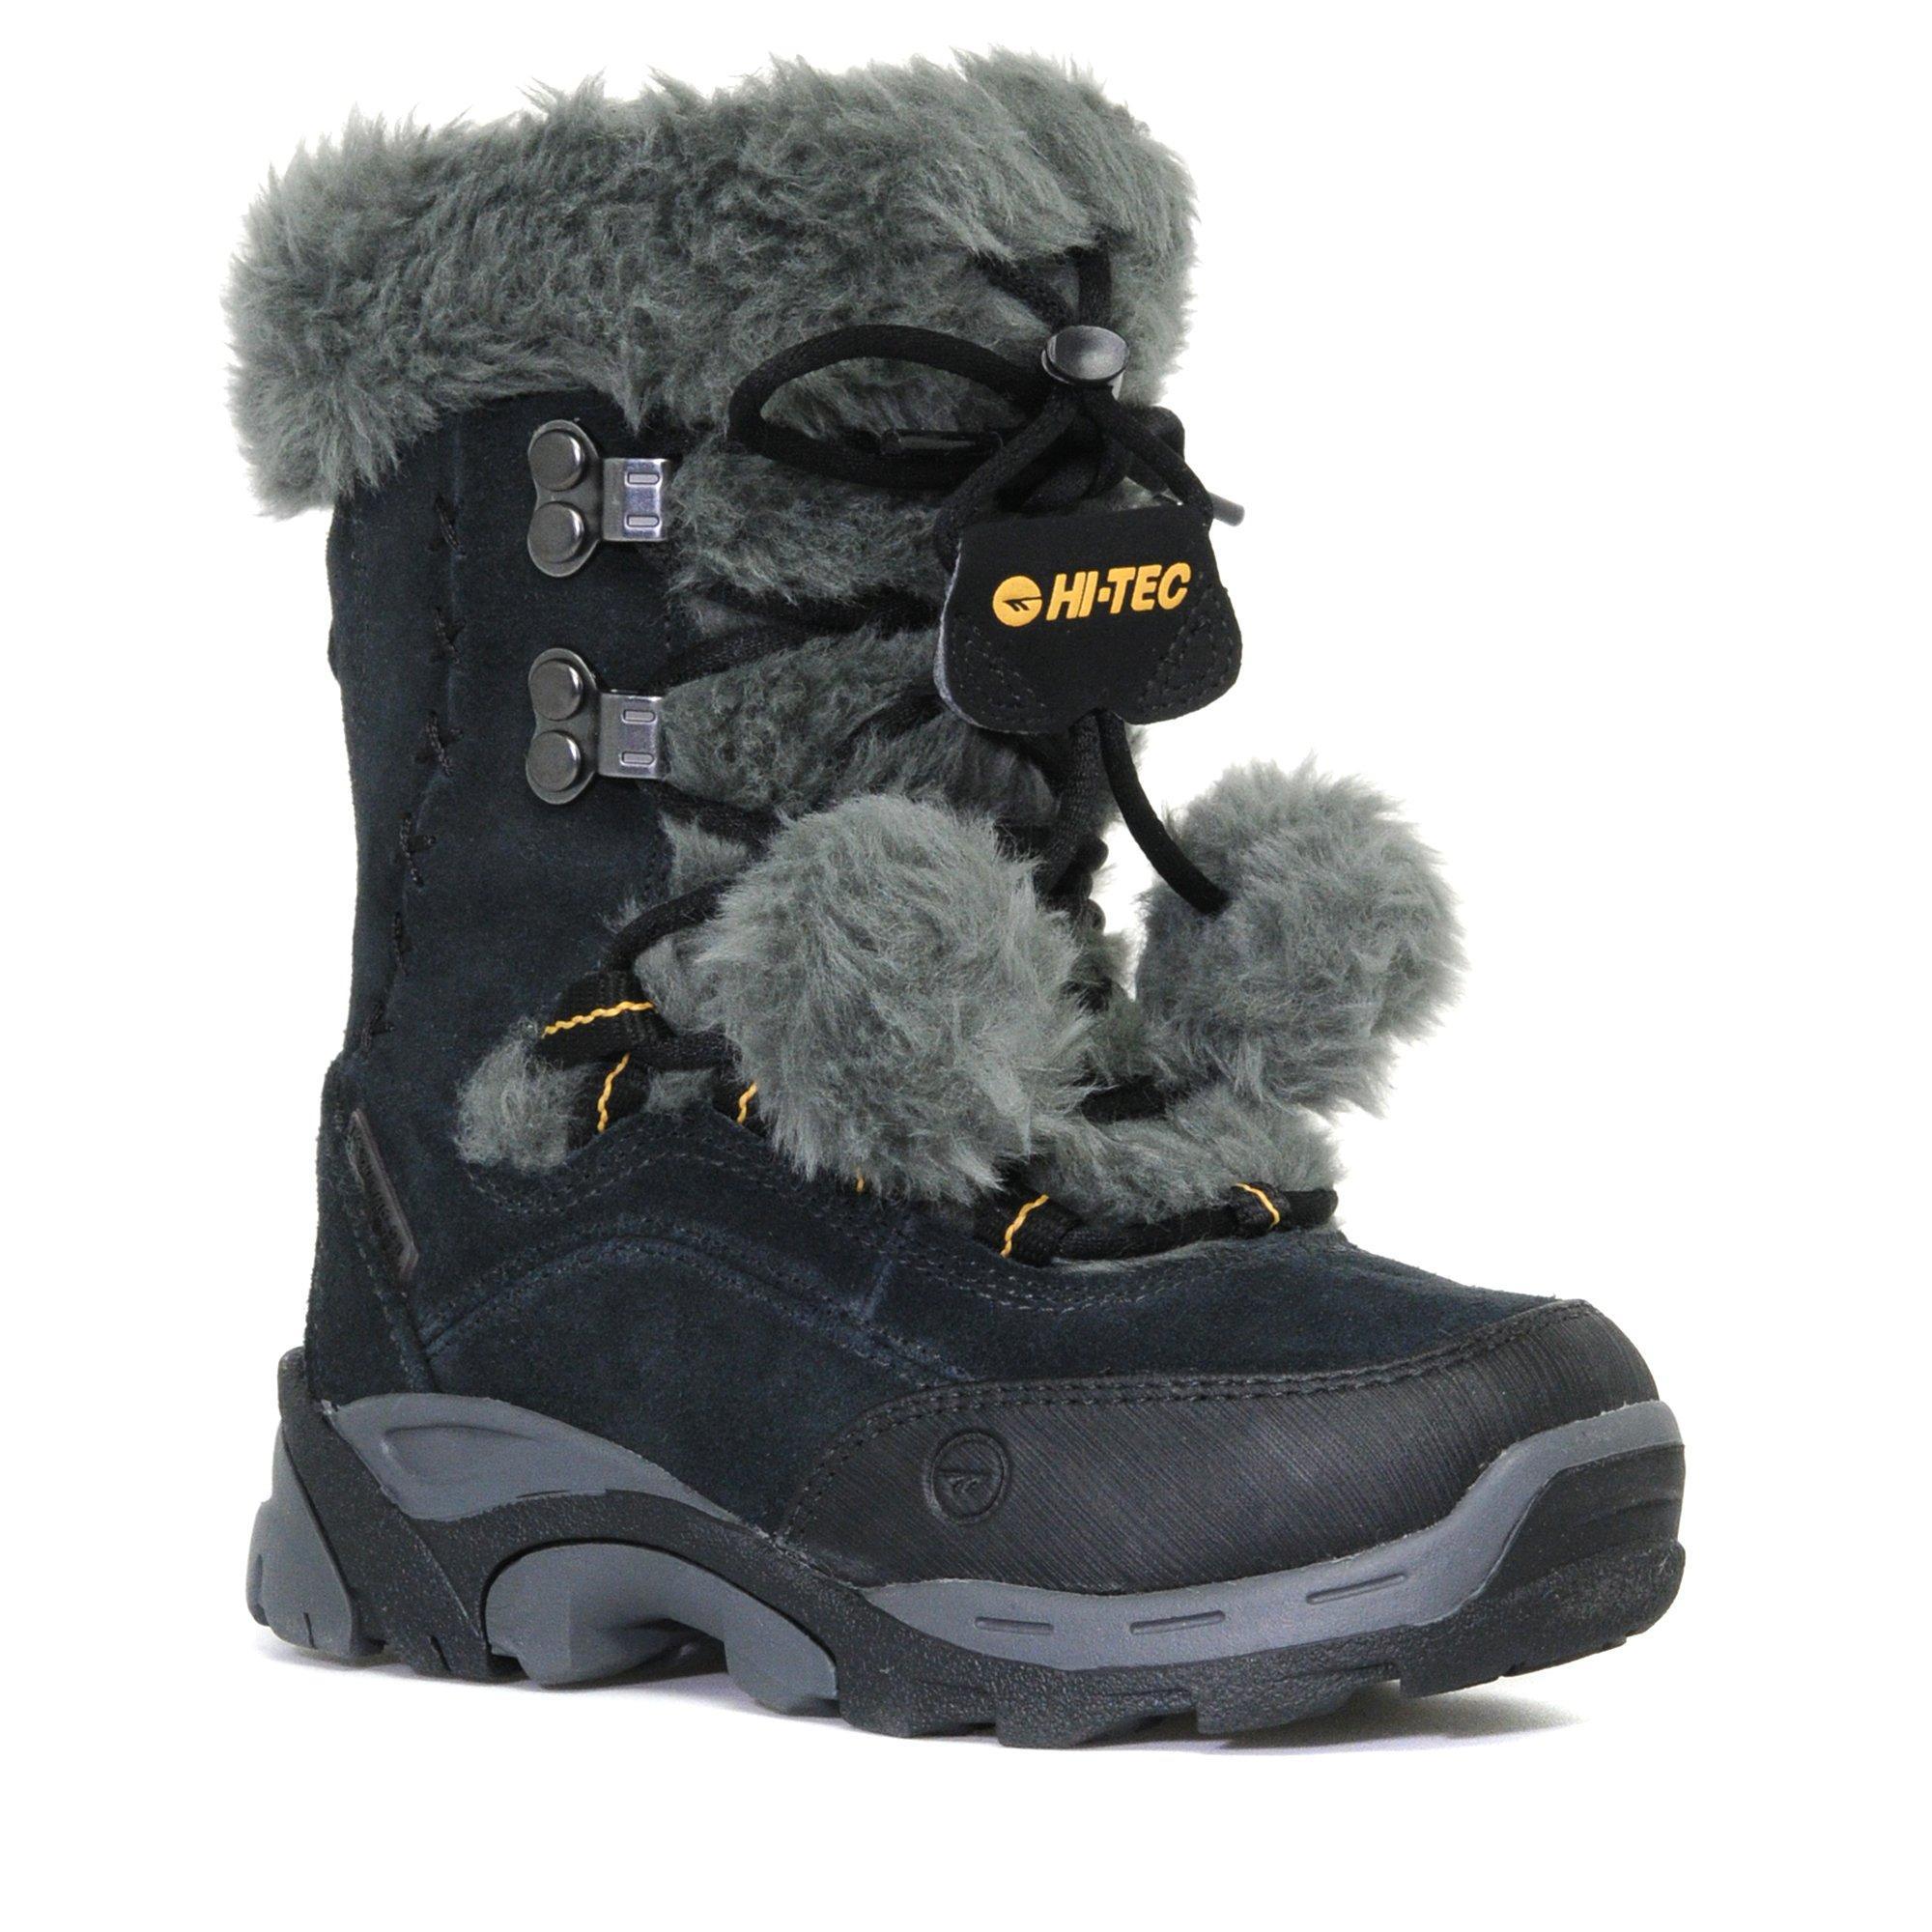 Hi-Tec Girls' St Moritz Snow Boot